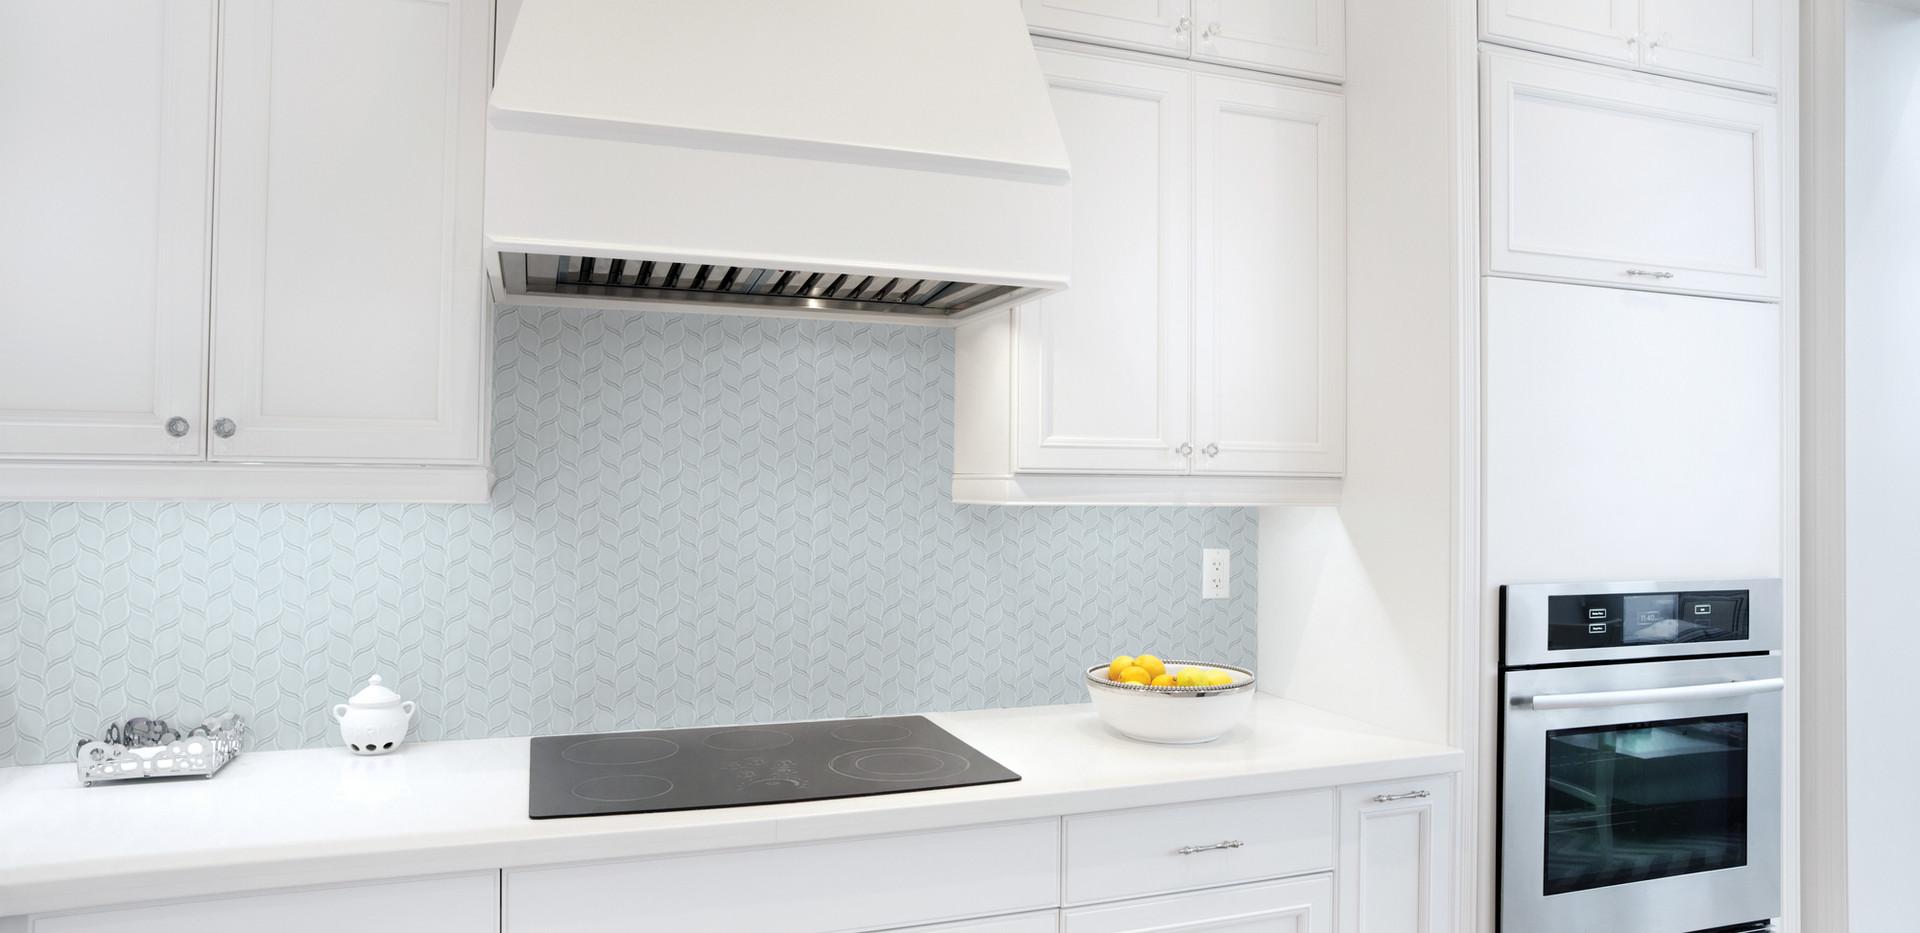 POM Truth Blue Petal Mosaic KitchenBacks